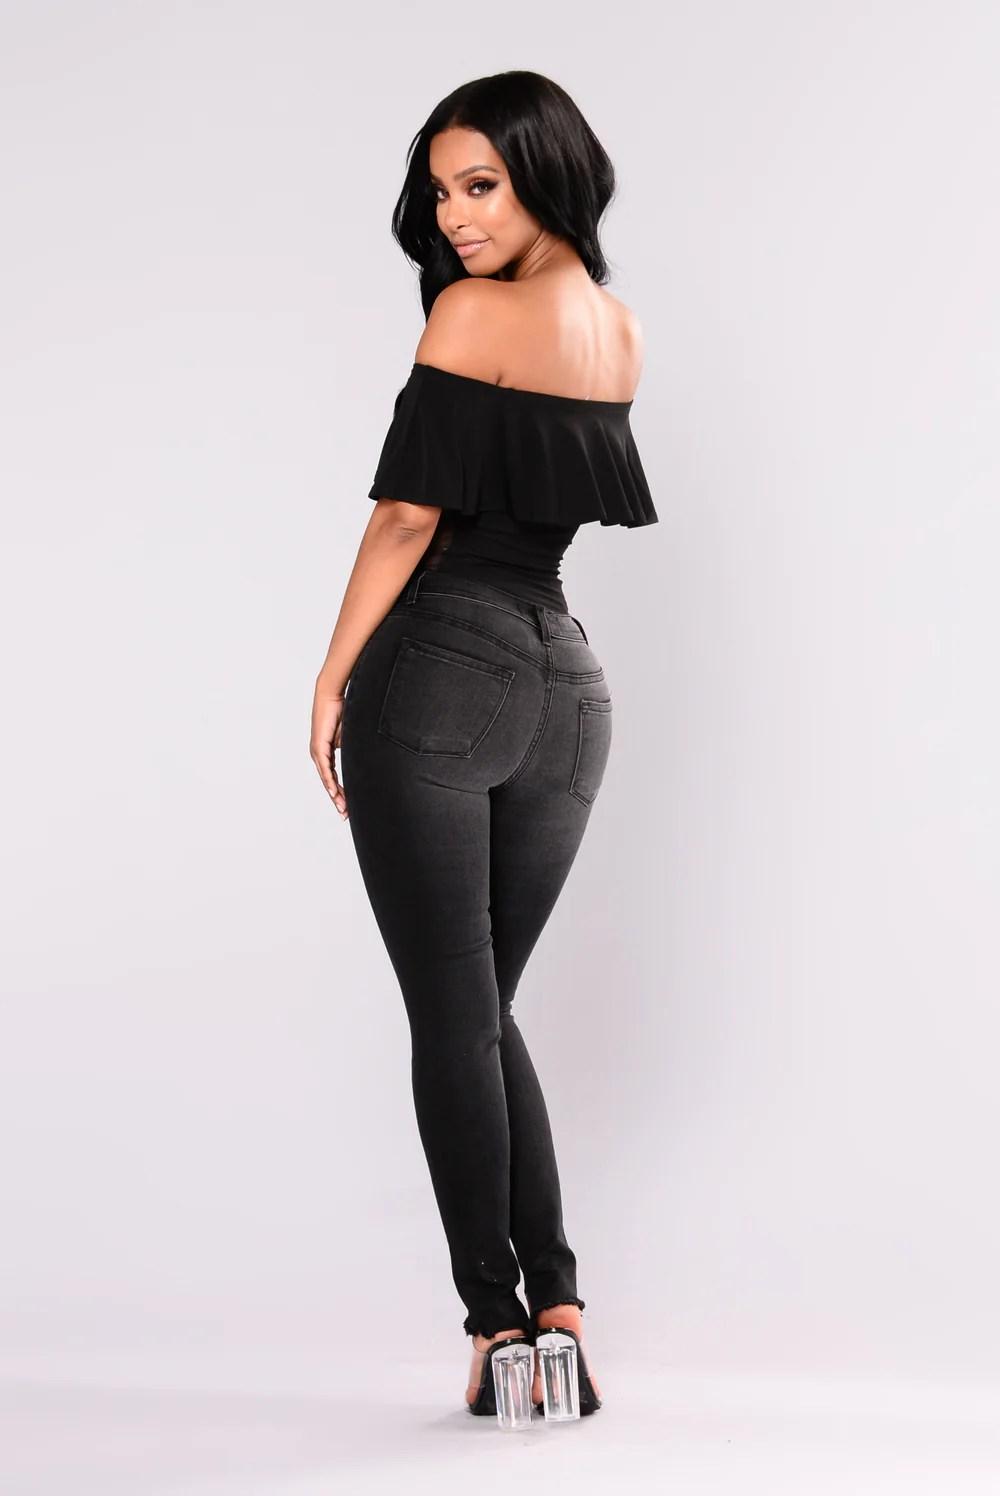 Melissa Sheer Sides Bodysuit - Black